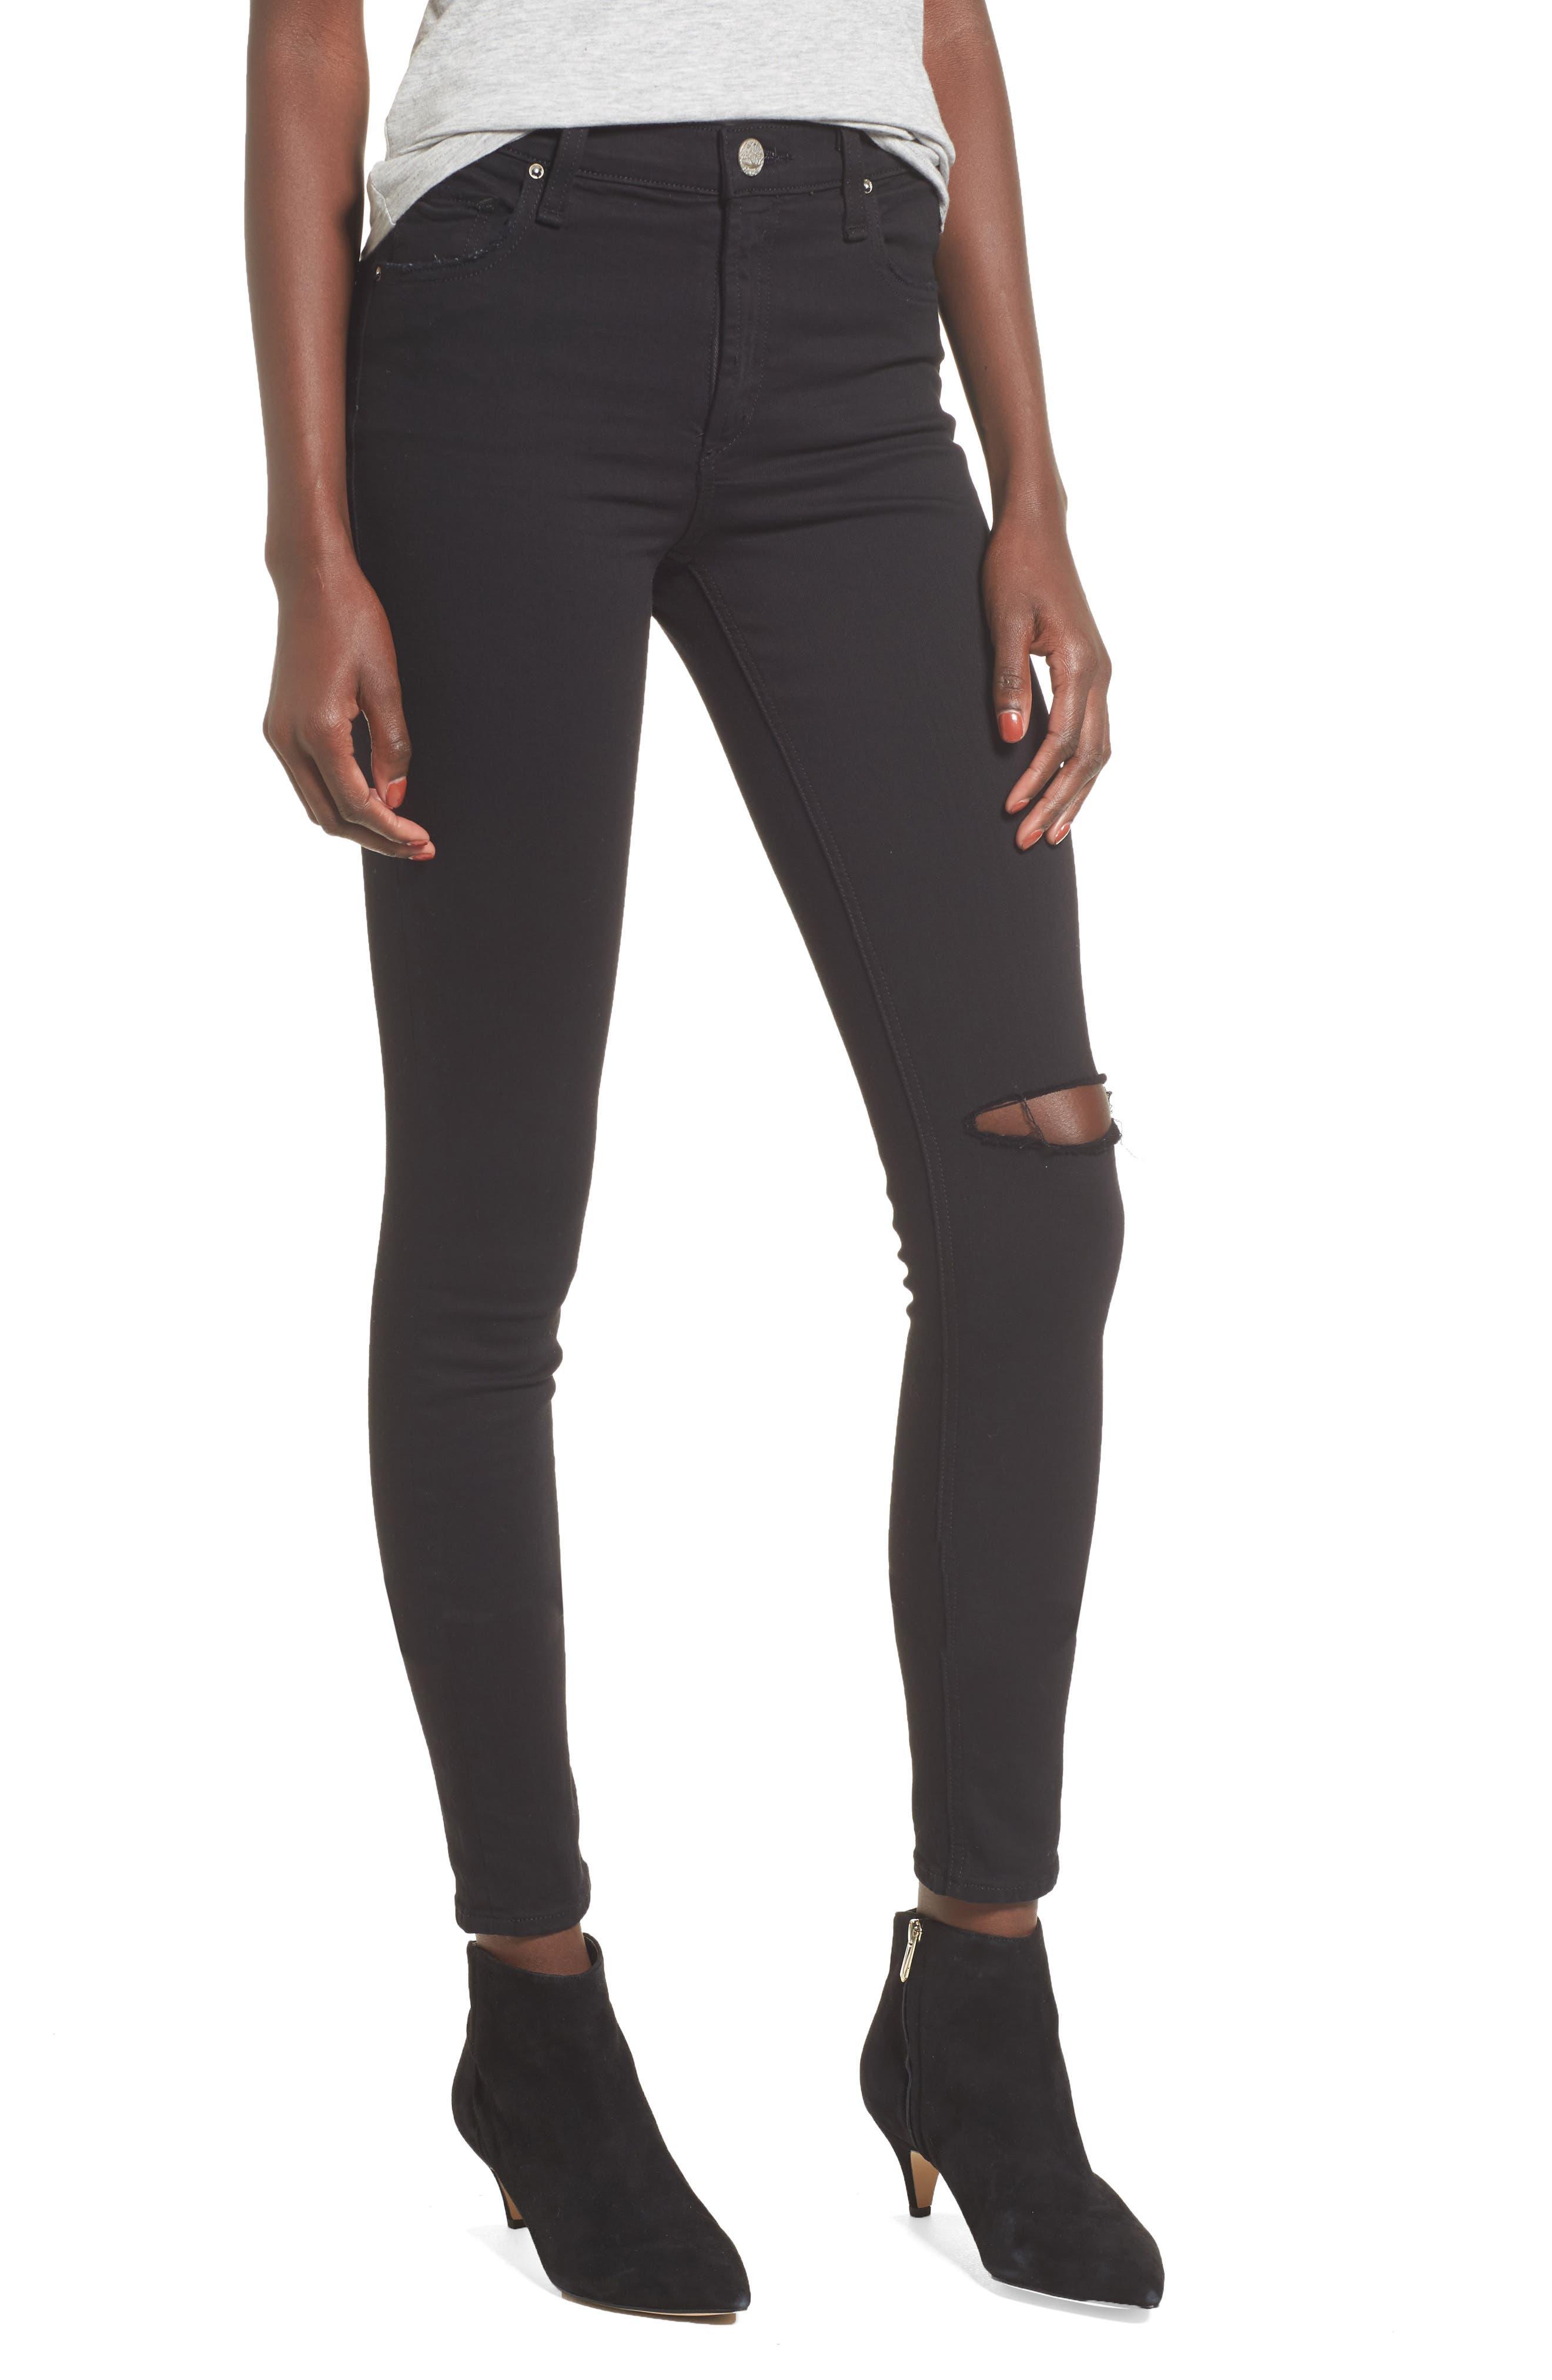 Newton High Waist Ankle Skinny Jeans,                         Main,                         color, 001